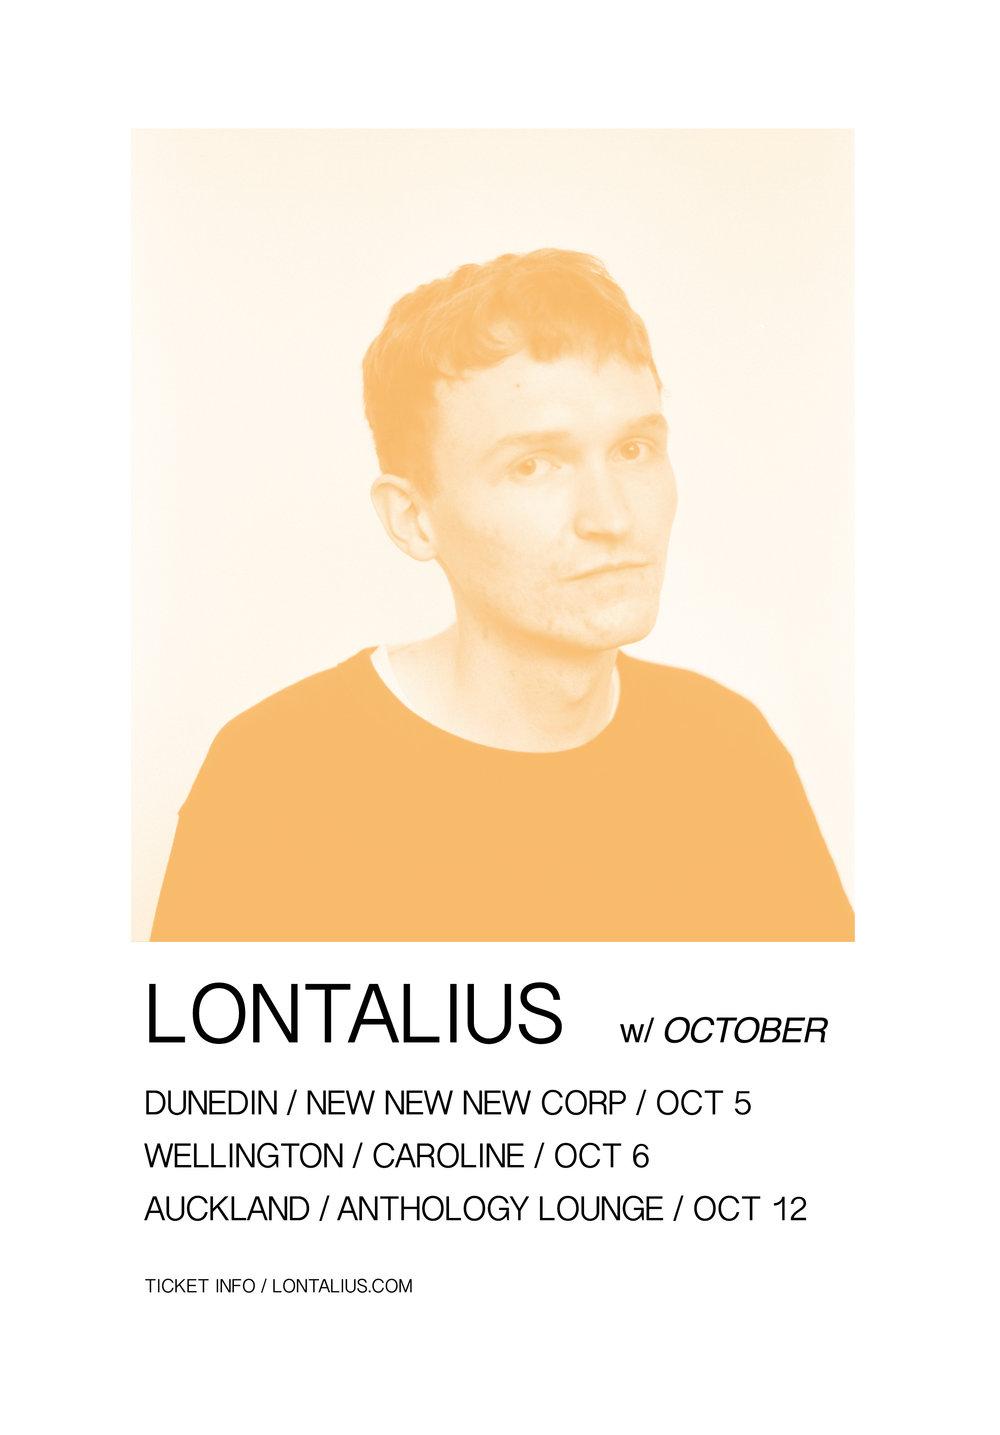 Lontalius-NZ-2018-Poster-update.jpg